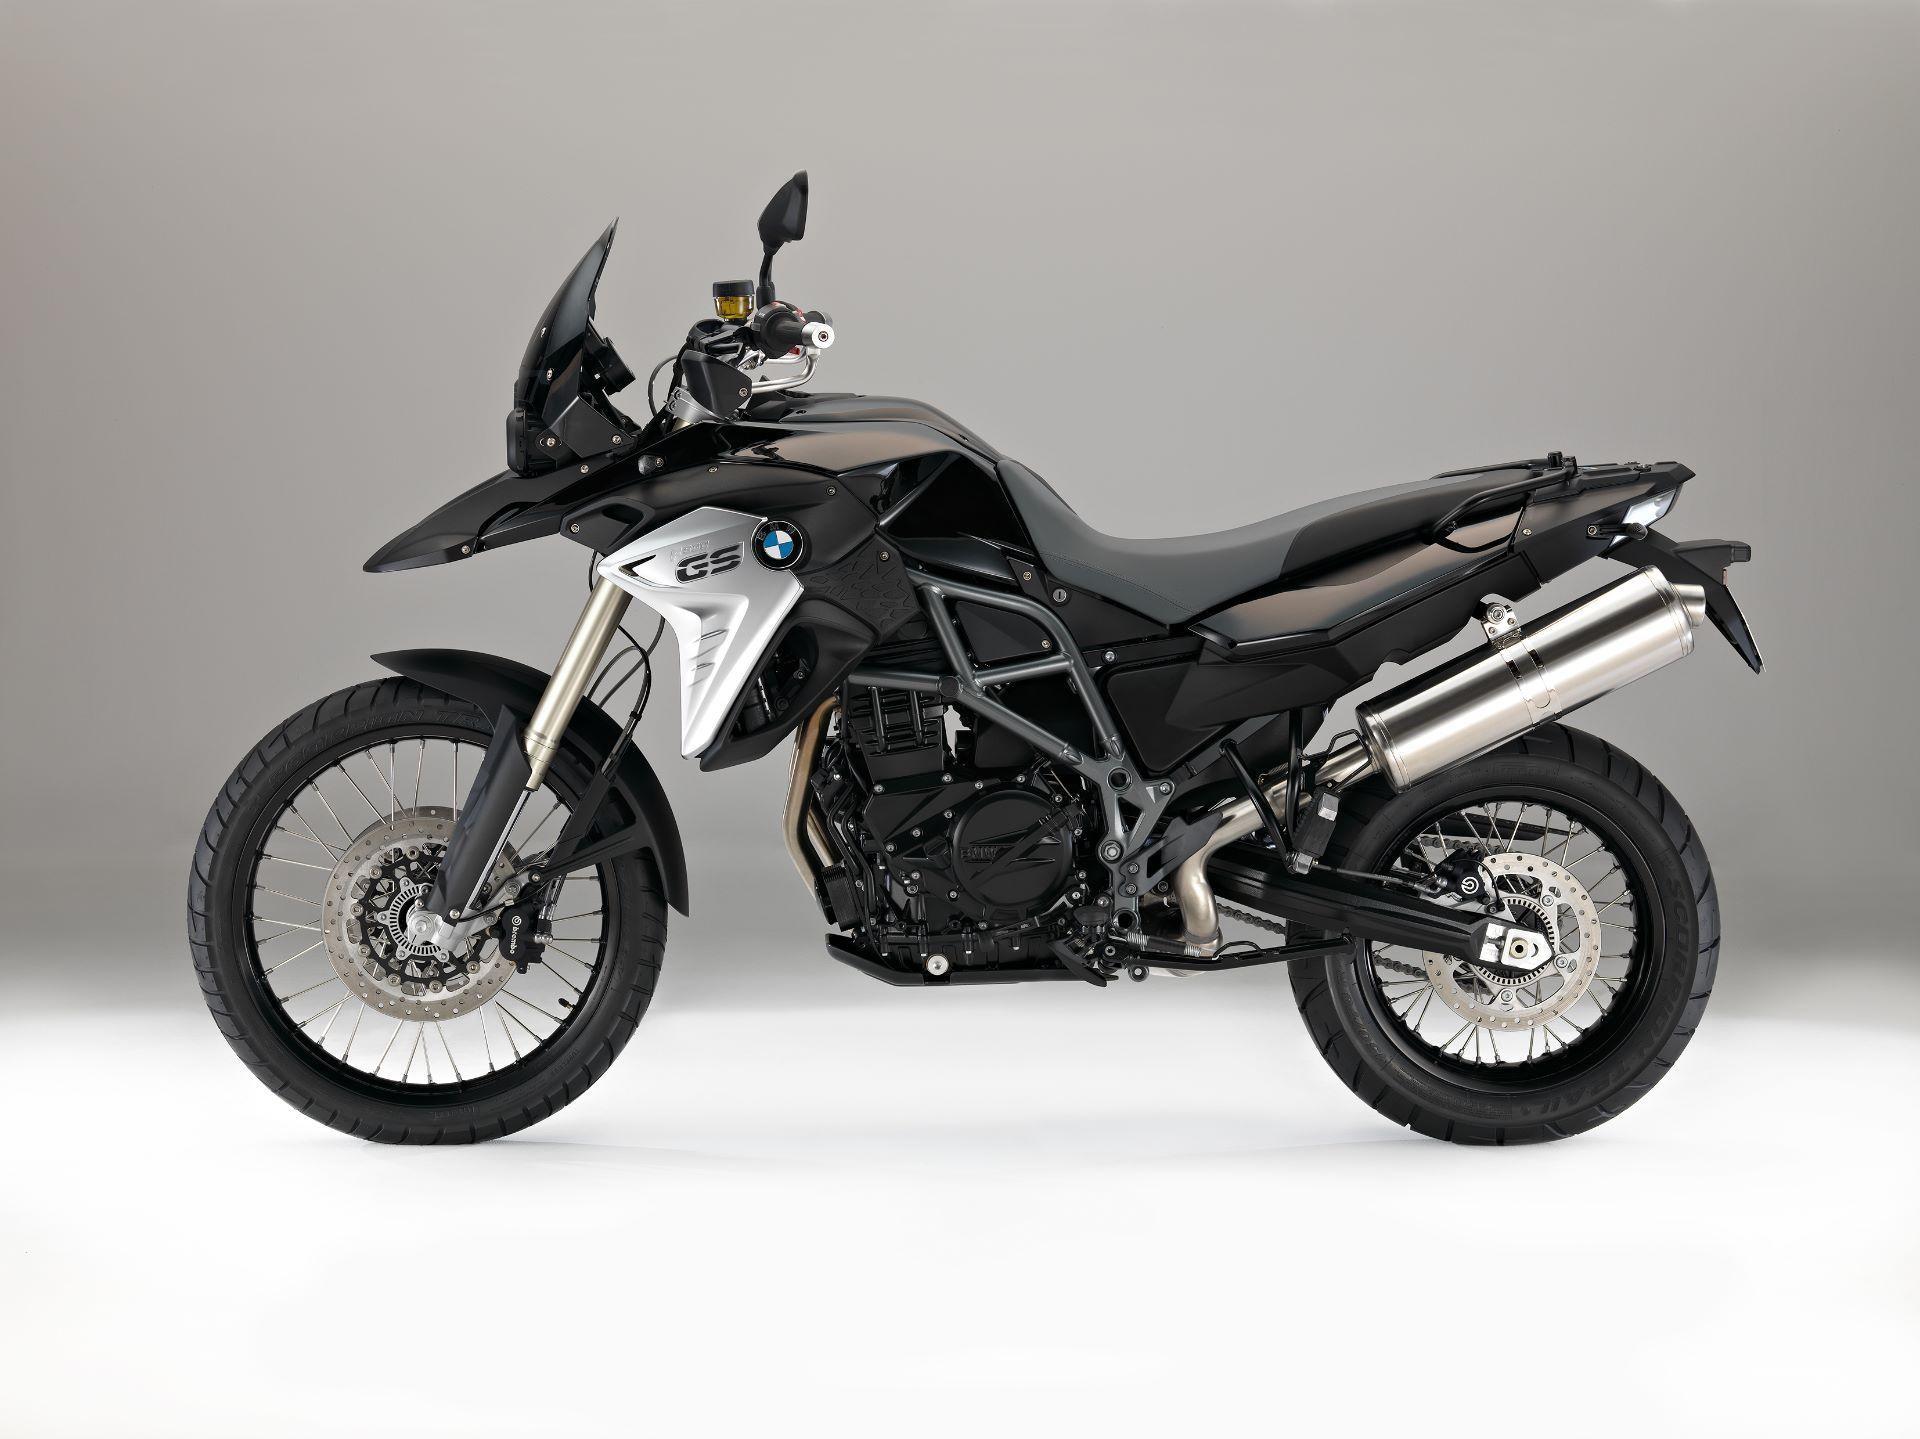 Motorrad Mieten & Roller Mieten BMW F 800 GS